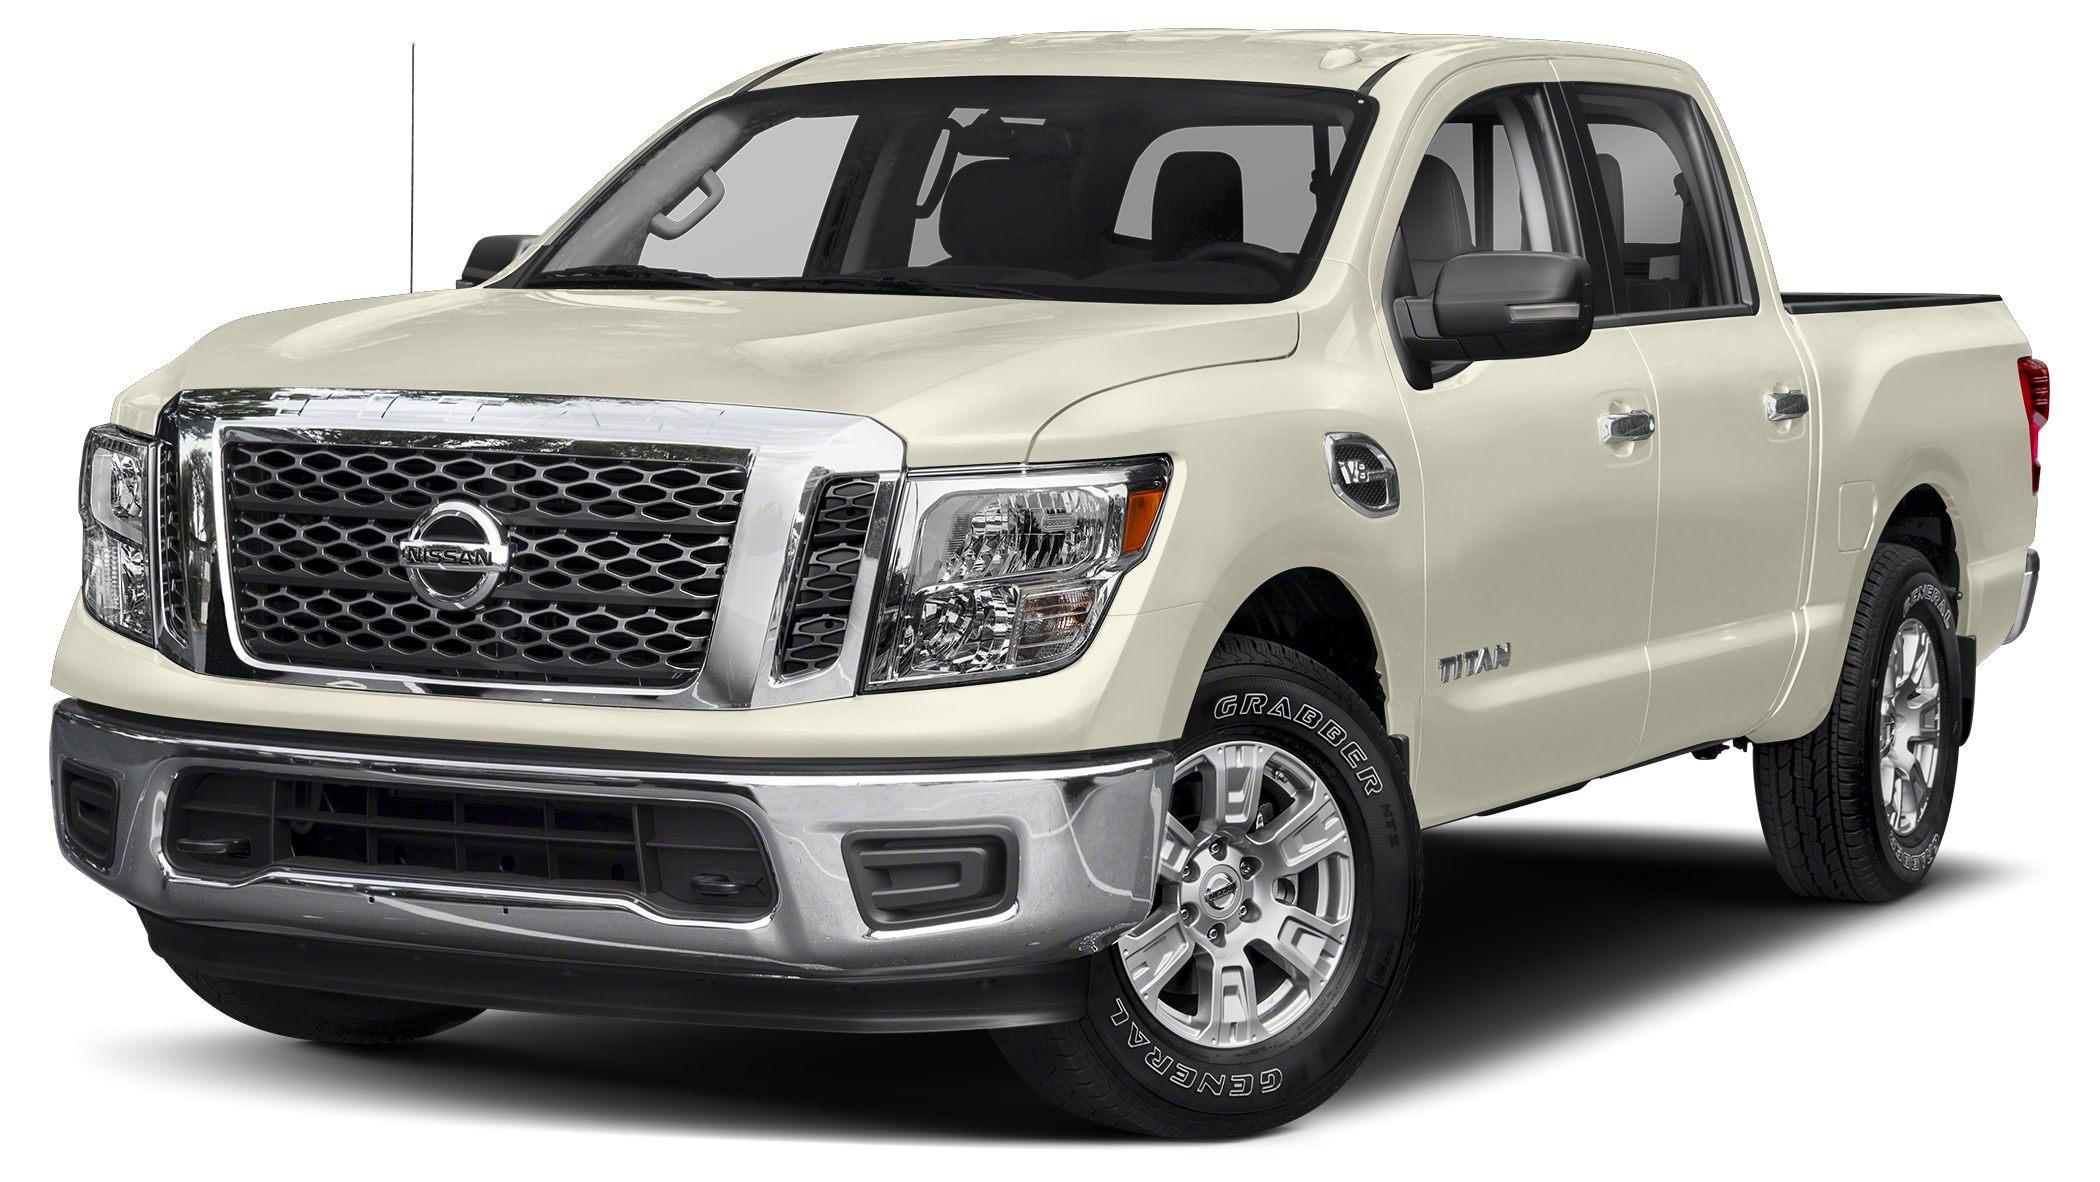 2017 Nissan Titan Platinum Miles 14Color Pearl White Stock 7170146 VIN 1N6AA1E68HN514694